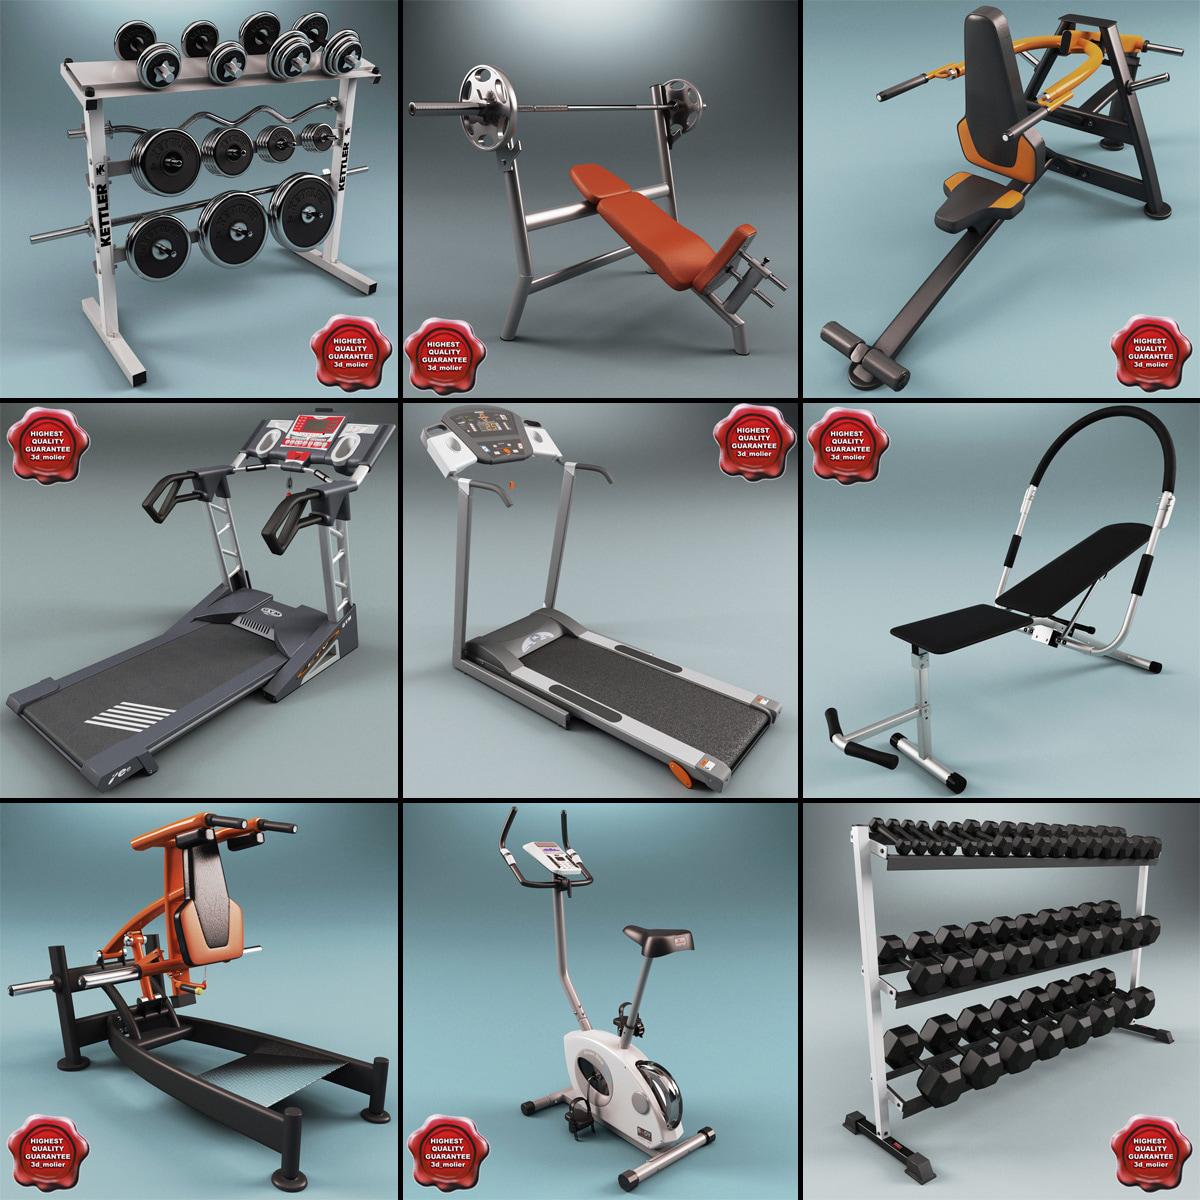 Gym_Equipment_Collection_V4_000.jpg